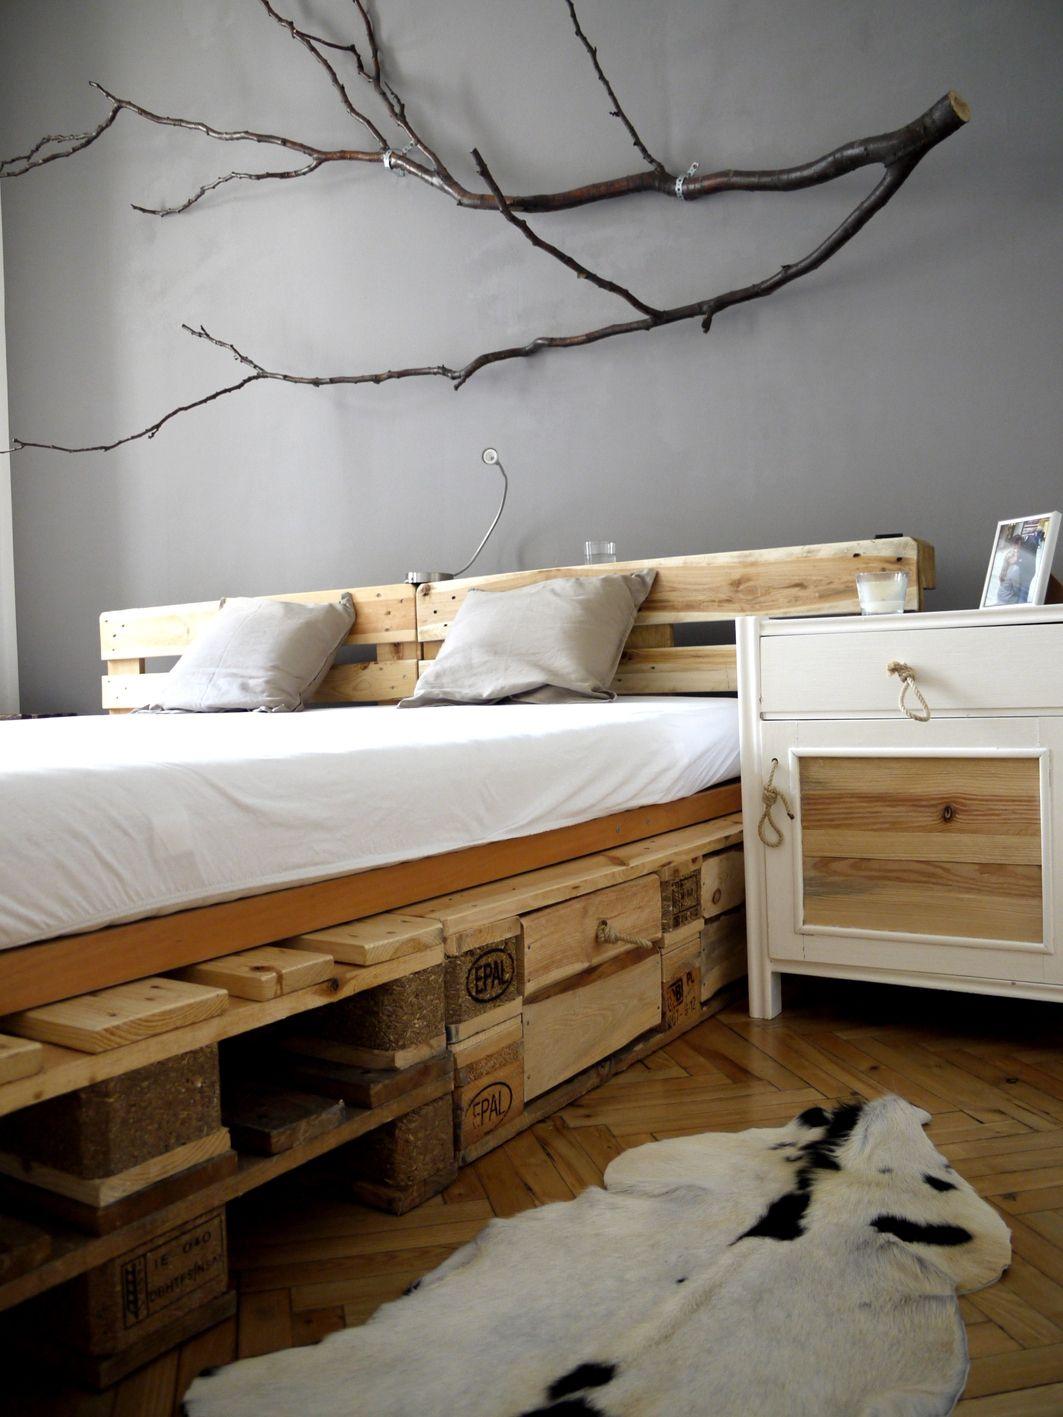 Das diy schlafzimmer in wien wanddeco pinterest schlafzimmer bett und m bel - Diy schlafzimmer ...